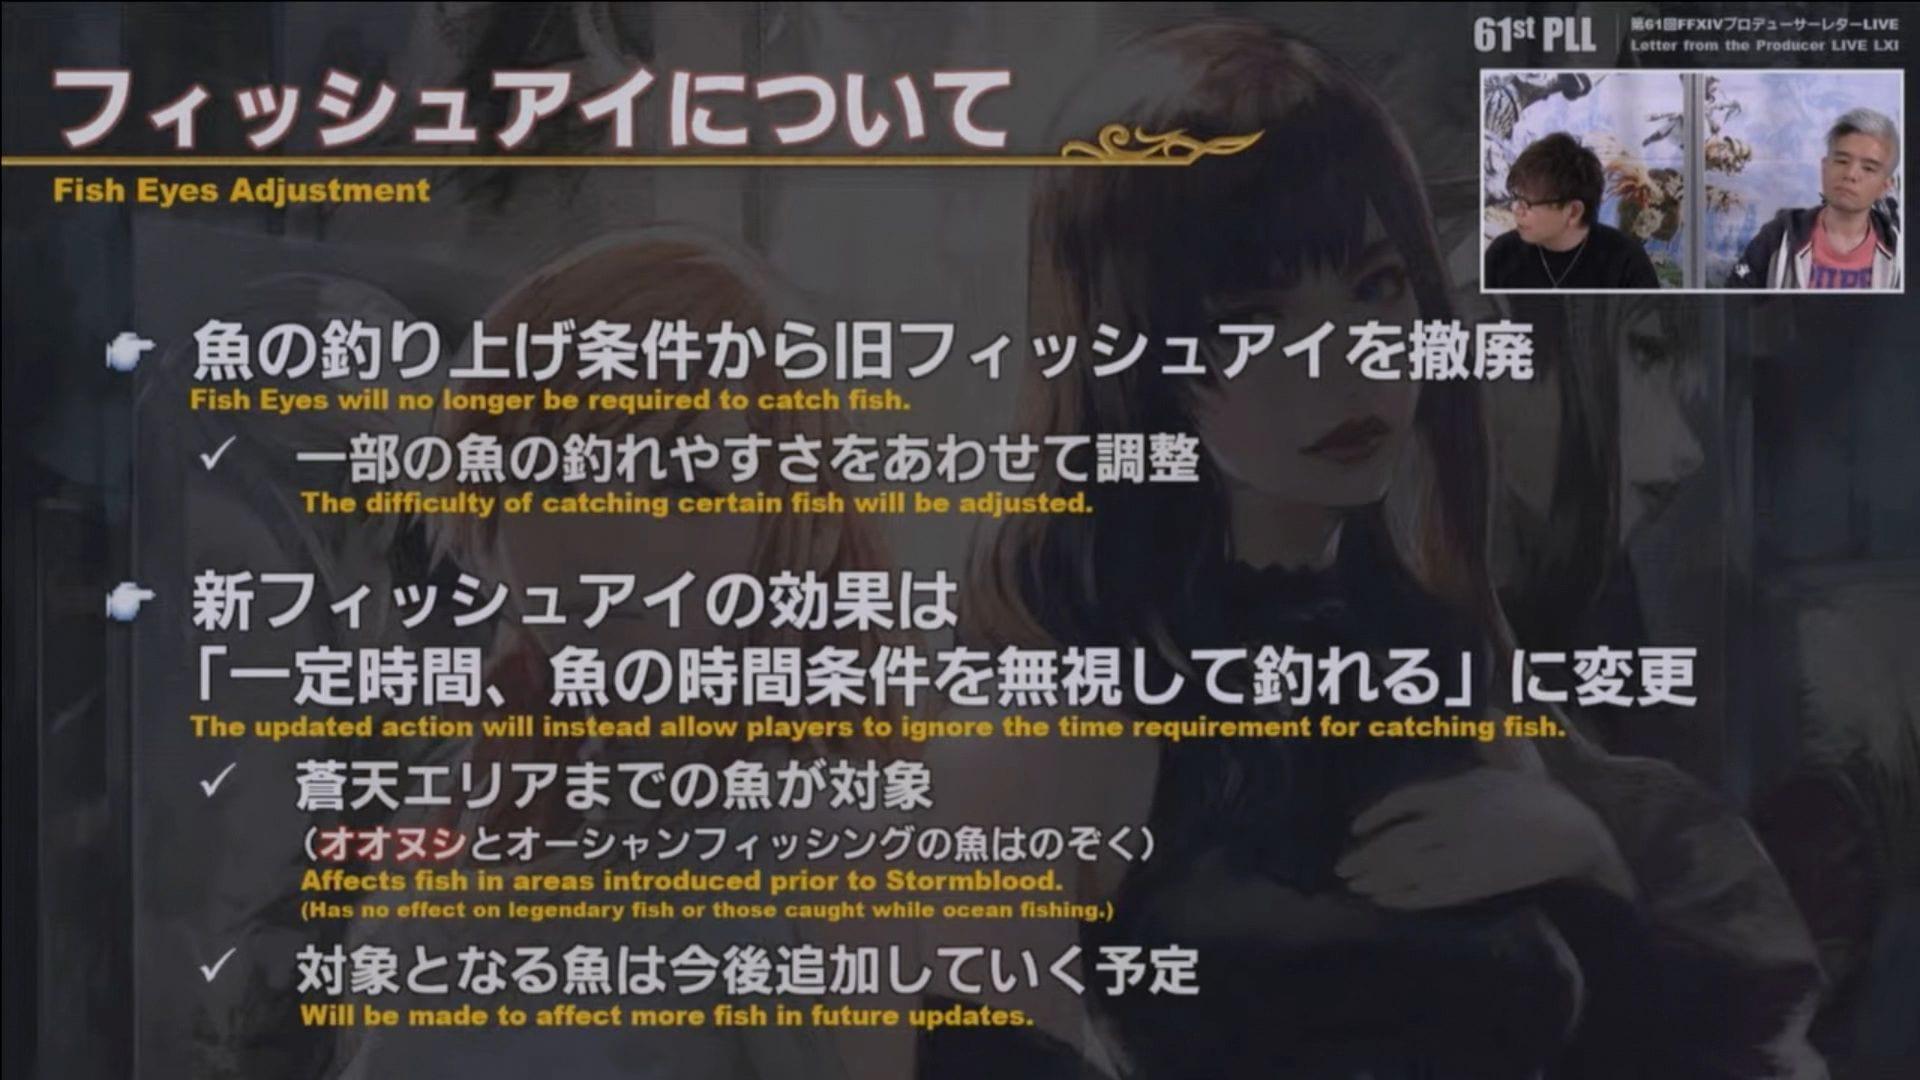 Final-Fantasy-XIV-Screenshot-2020-11-27-13-24-55.jpg